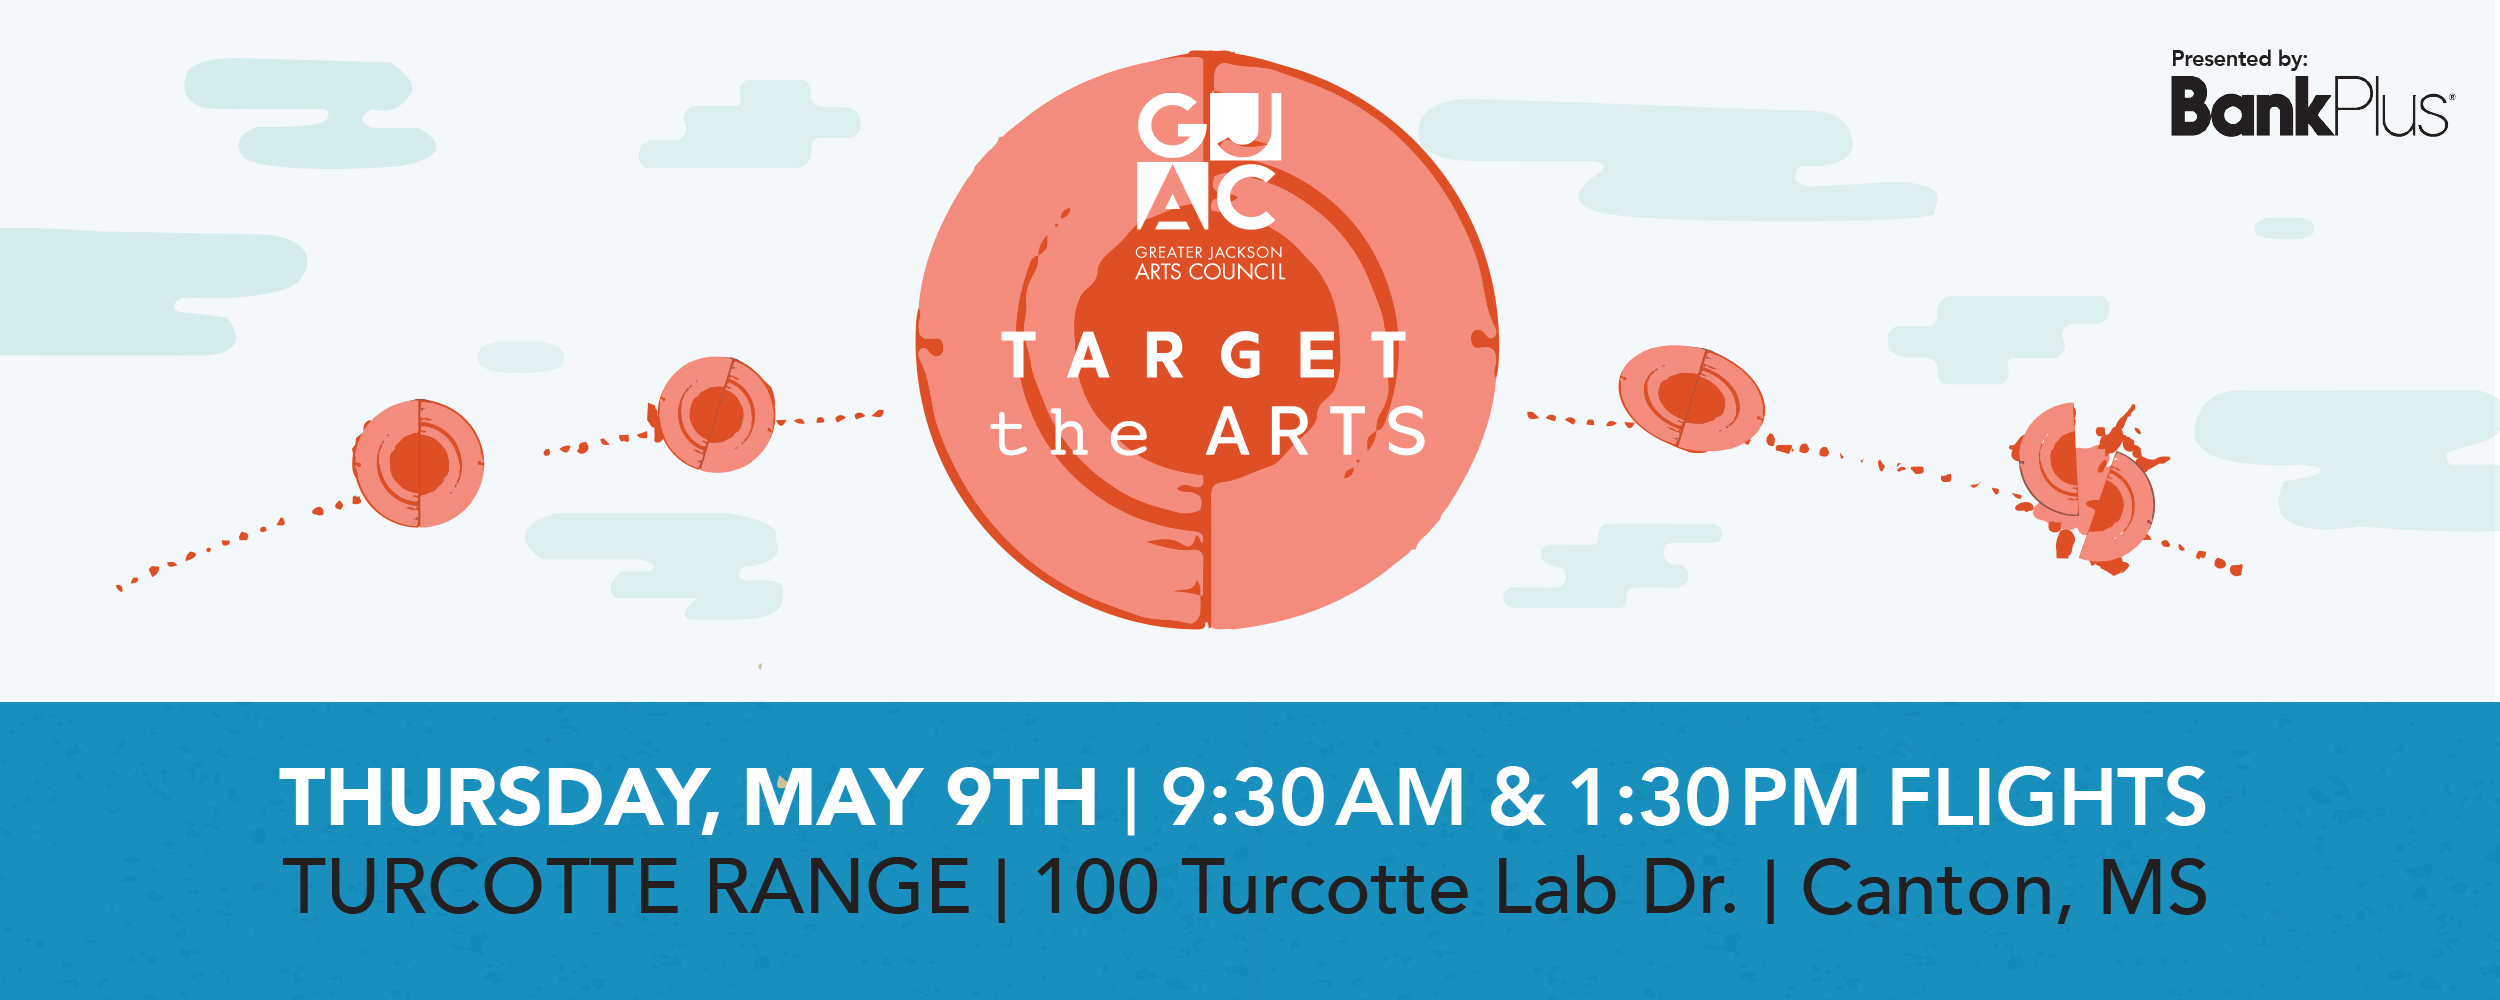 Target the Arts Web Banner.jpg